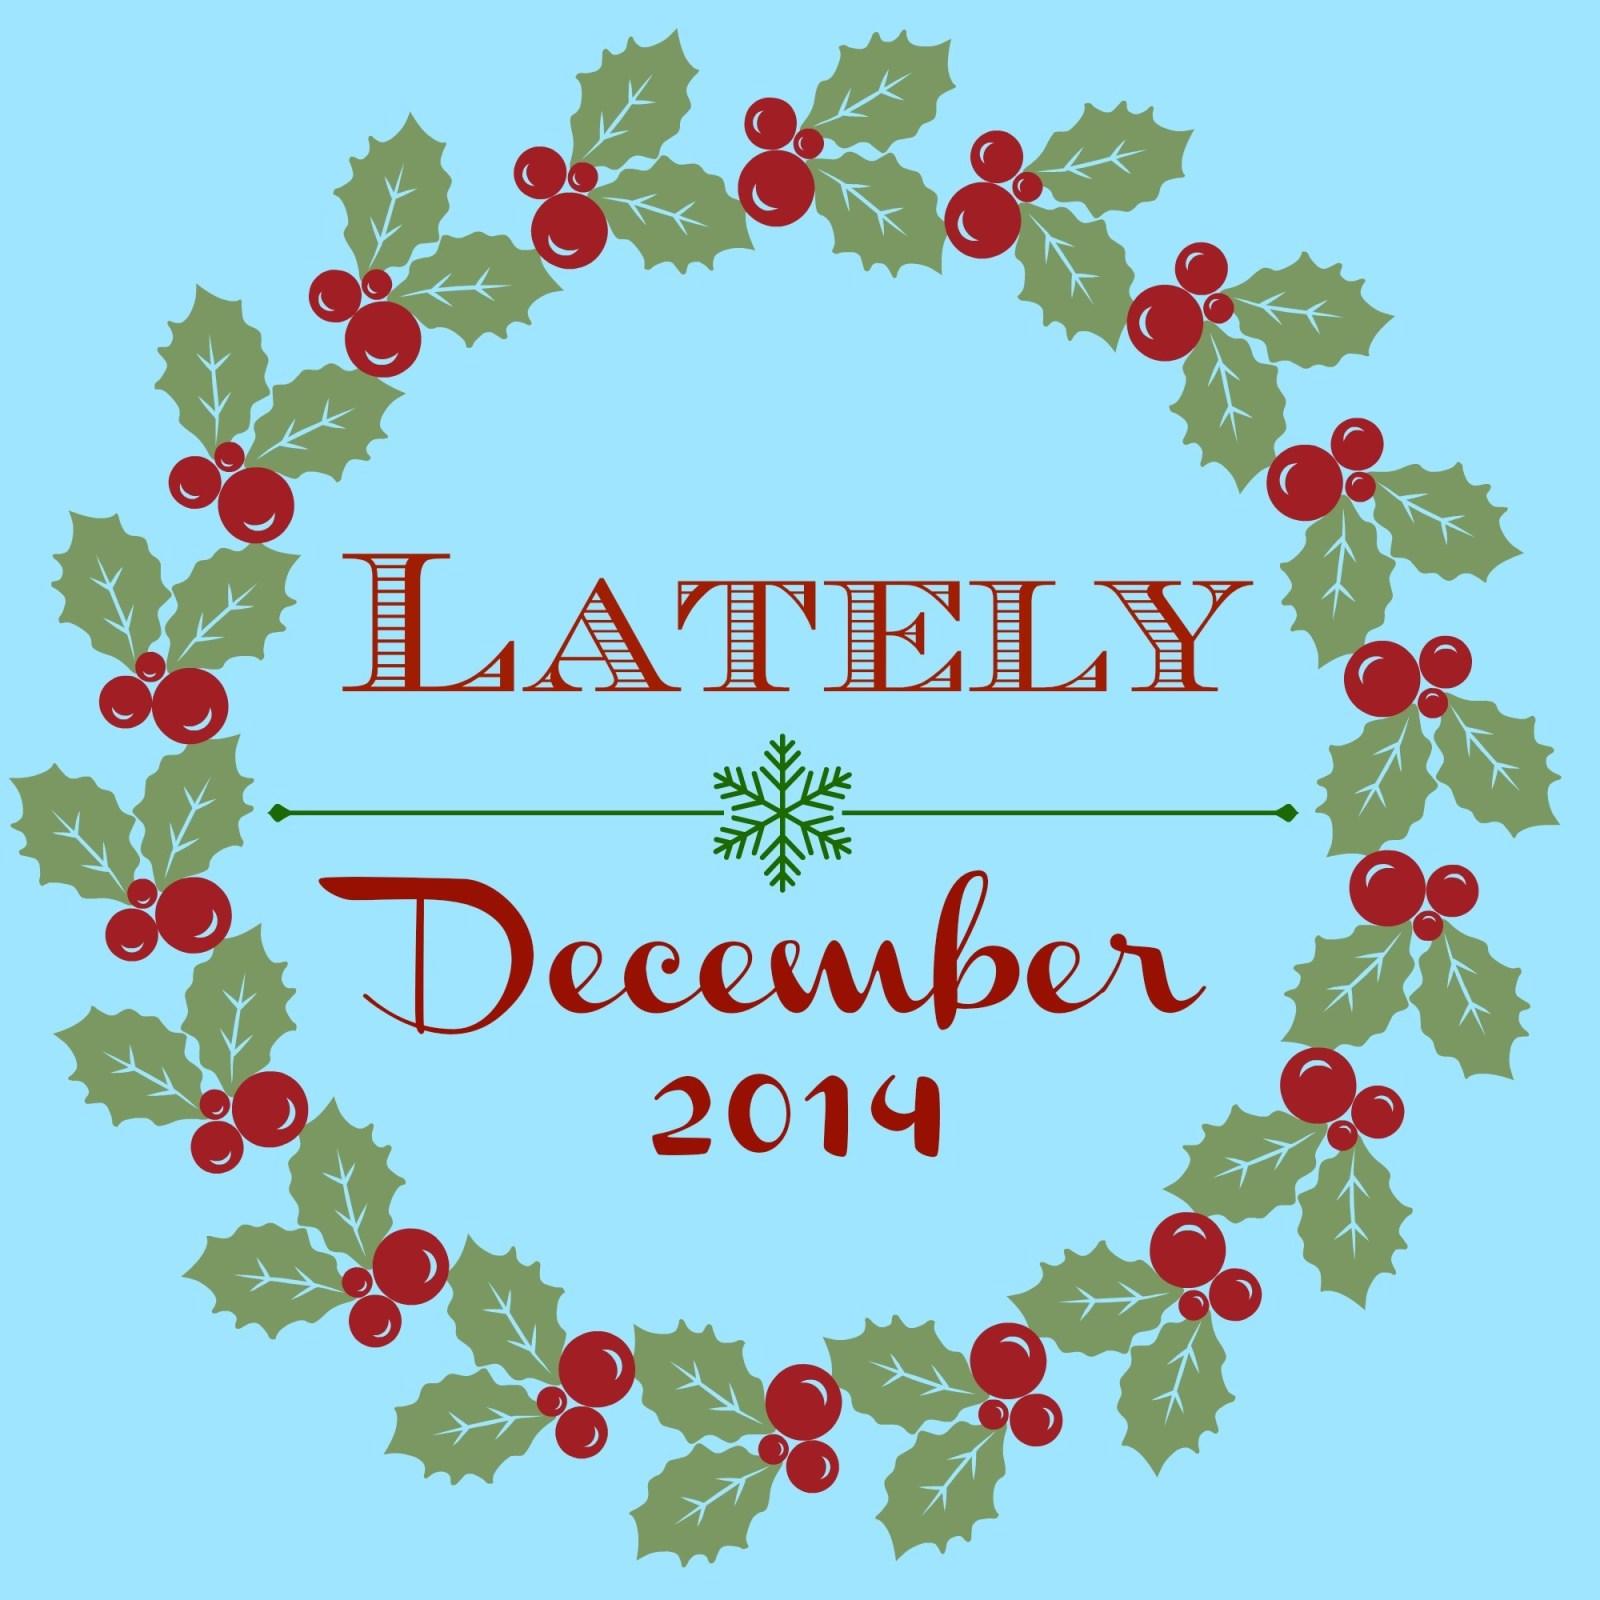 Lately // December 2014